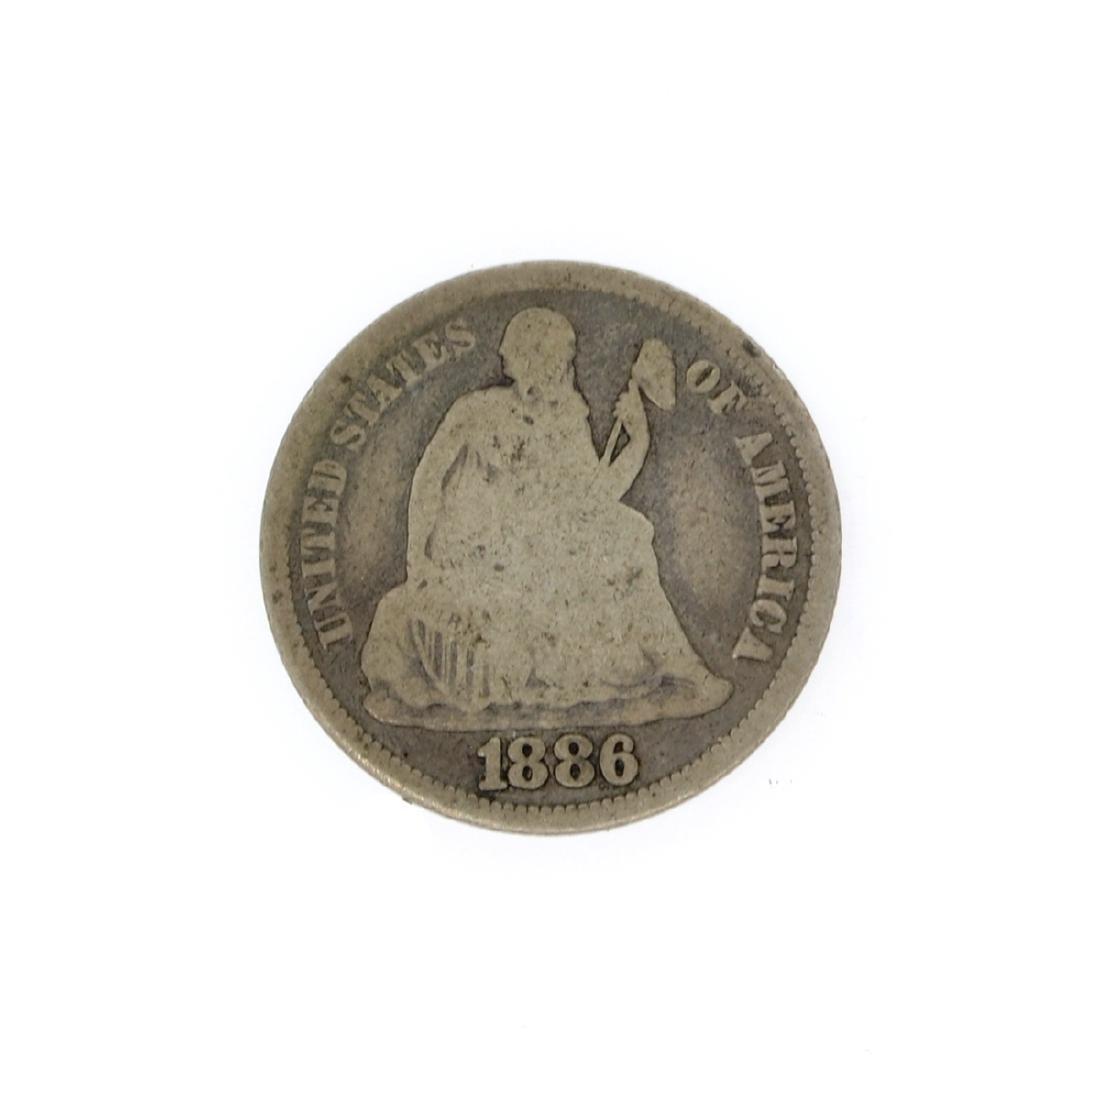 Rare 1886 Liberty Seated Dime Coin